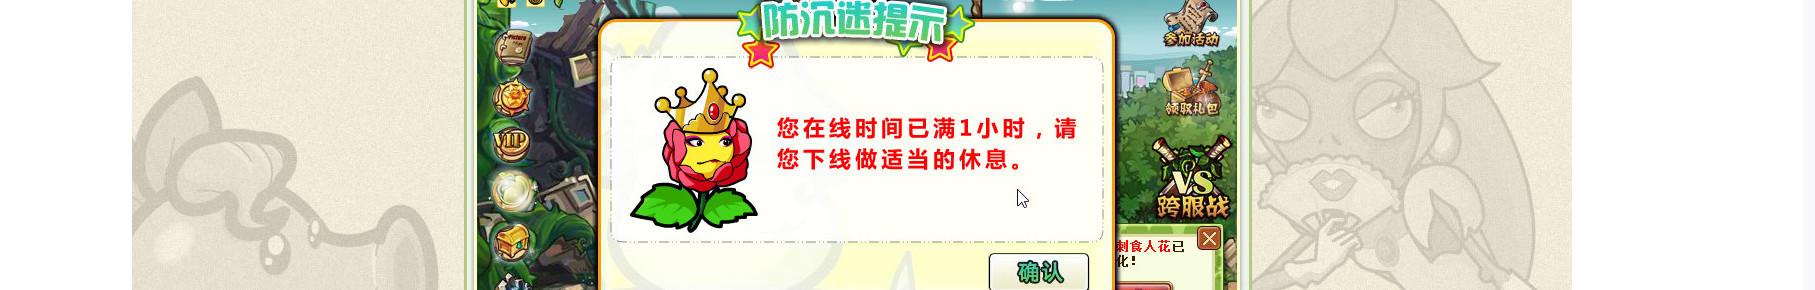 杨爽视频空间2 banner